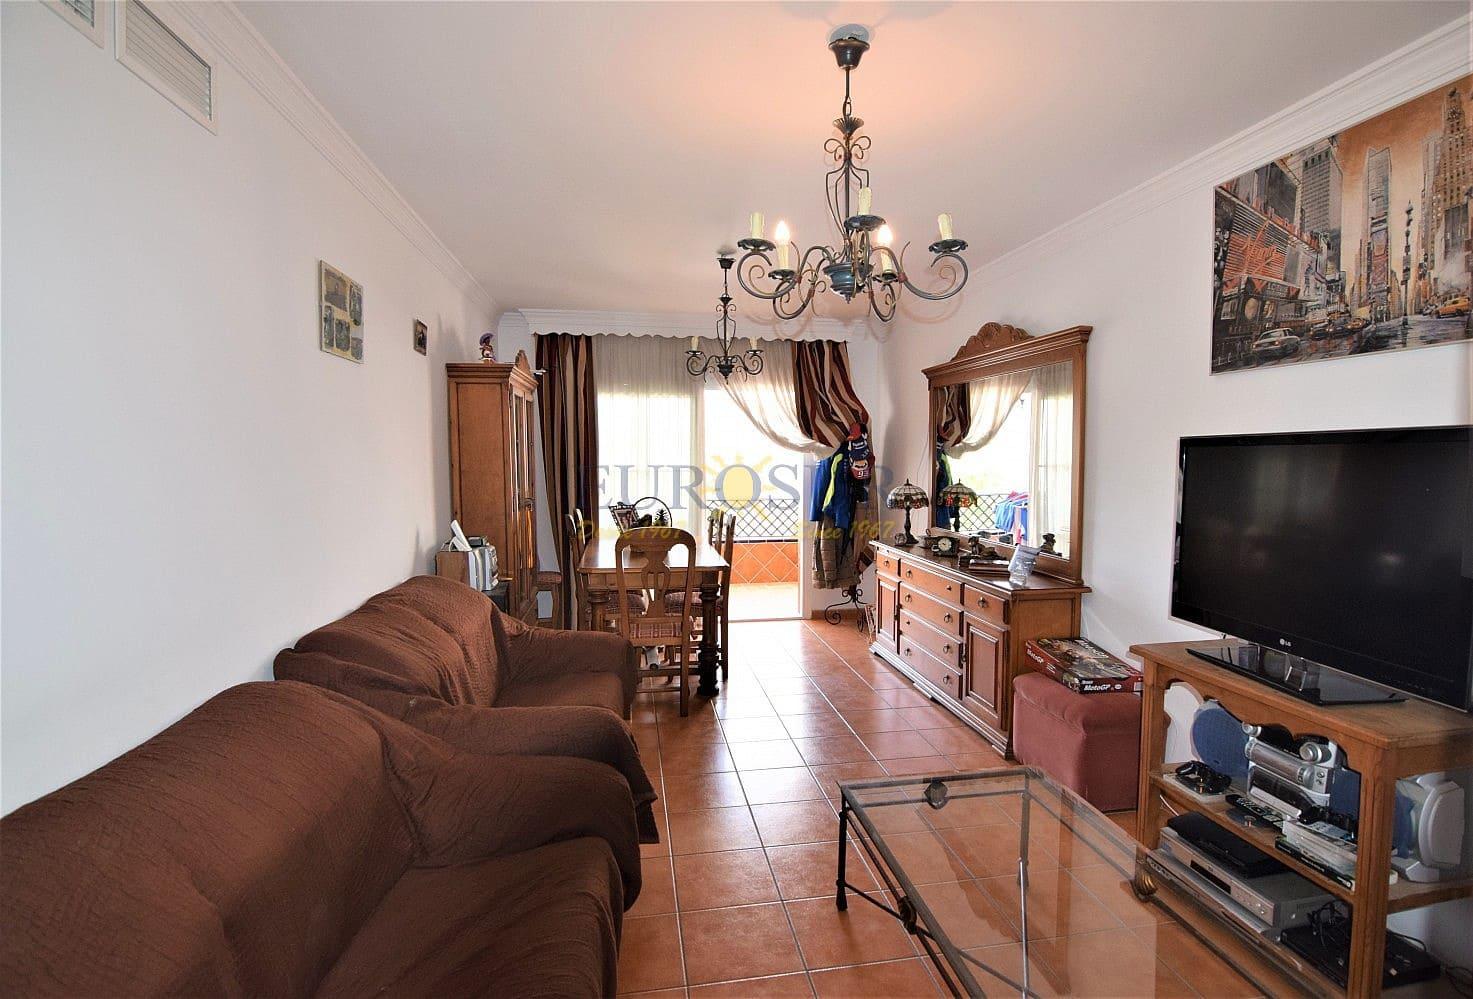 2 bedroom Apartment for sale in Nerja - € 255,000 (Ref: 4709495)